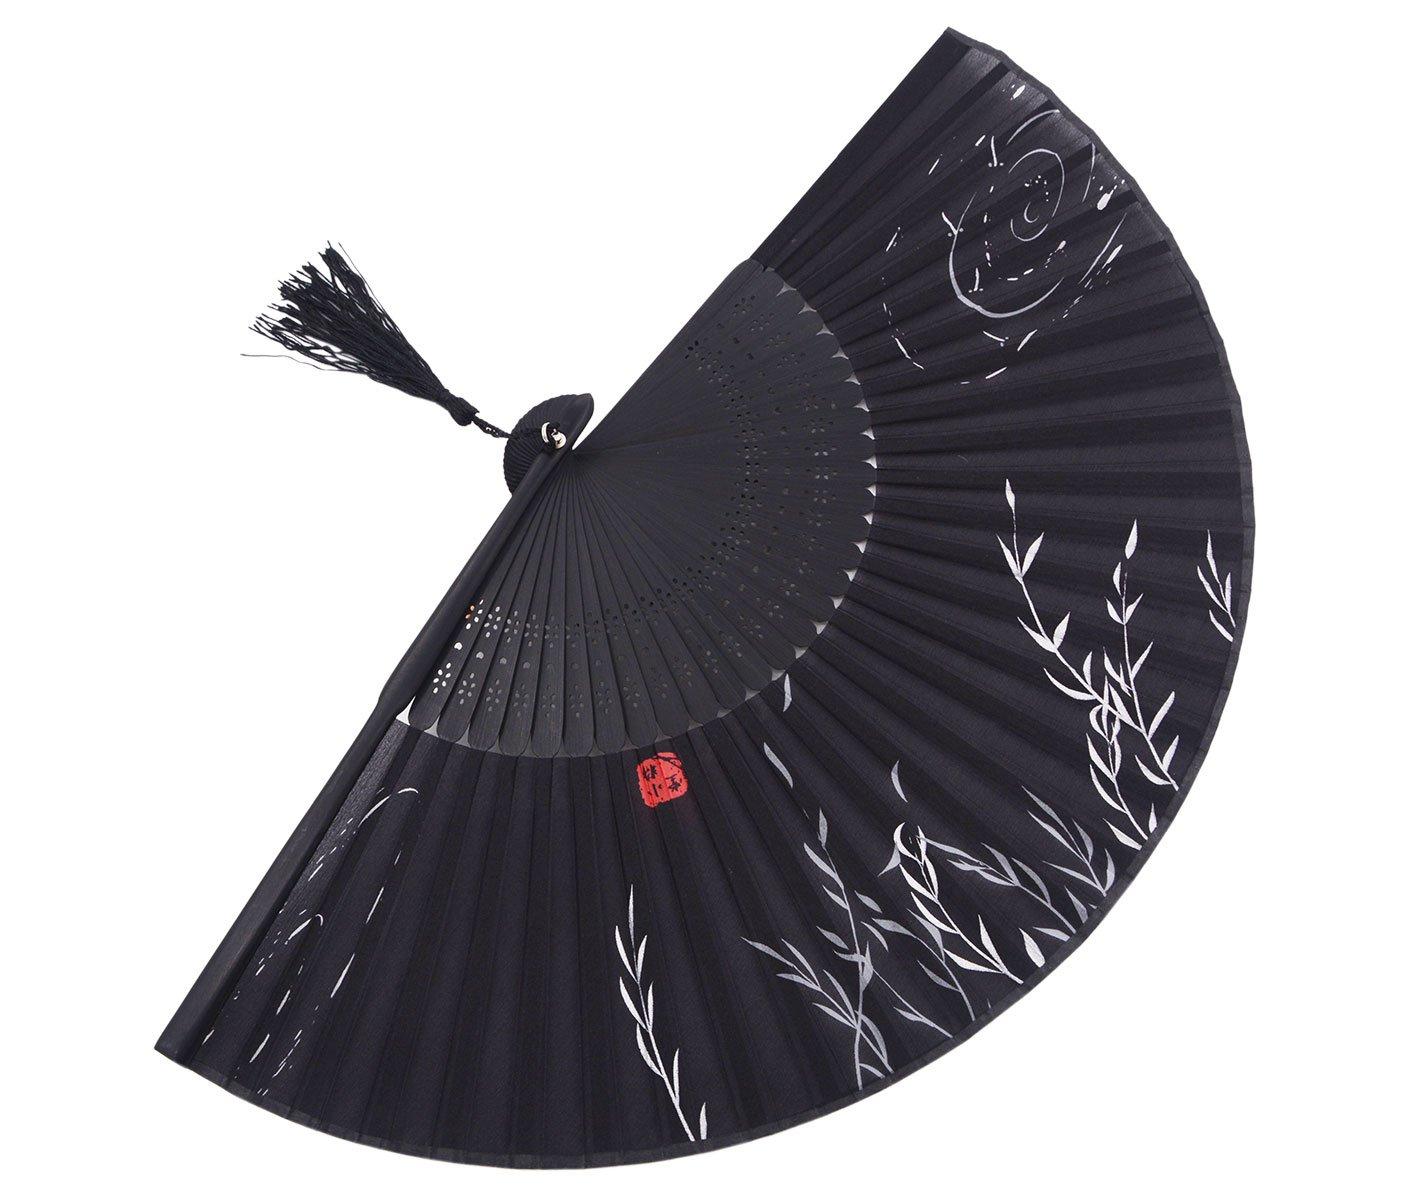 AW-4 Amajiji Chinese Japanese Handheld Folding Fan Black//White Plant and Red Seal,Chinese Vintage Retro Style